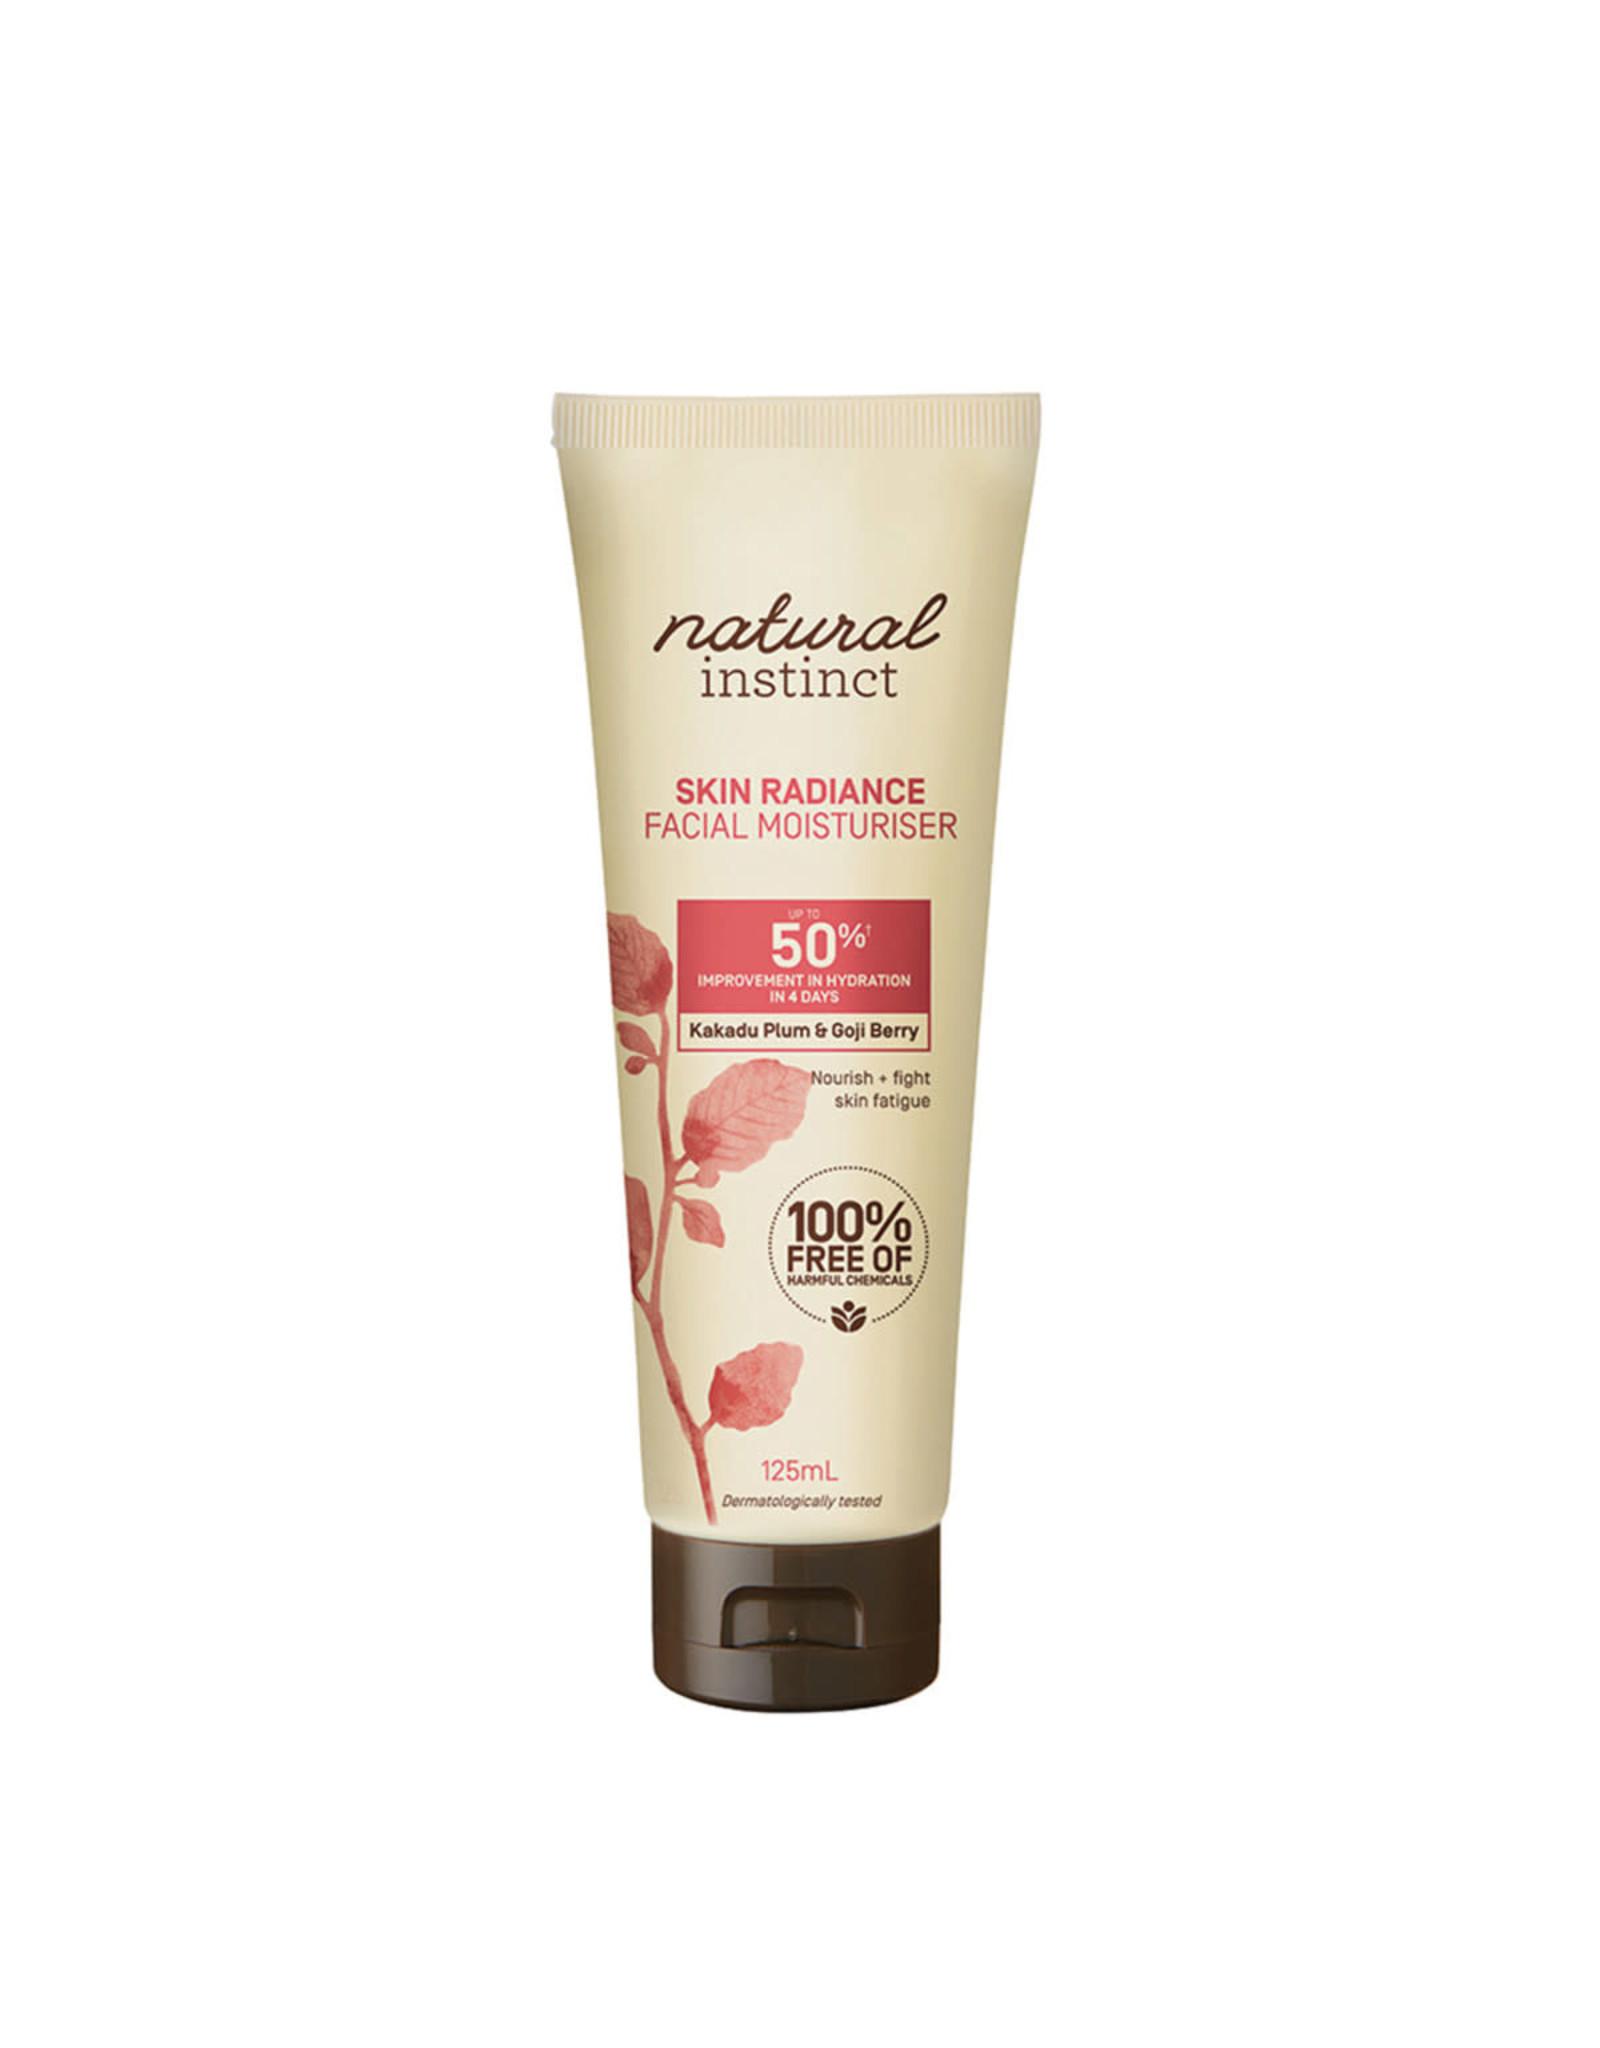 Natural Instinct Facial Moisturiser Skin Radiance 125ml